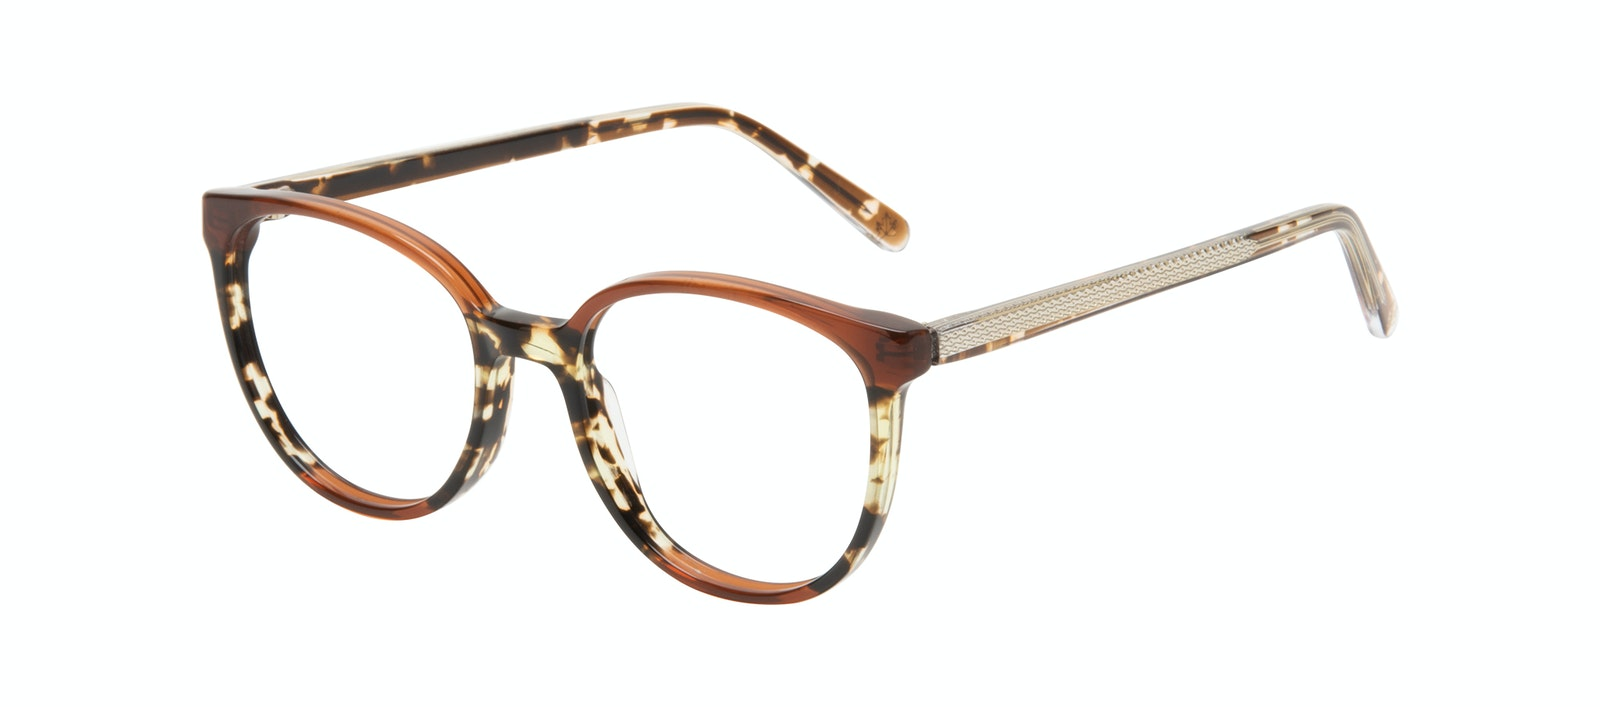 Affordable Fashion Glasses Round Eyeglasses Women Fauna Aurora Tilt